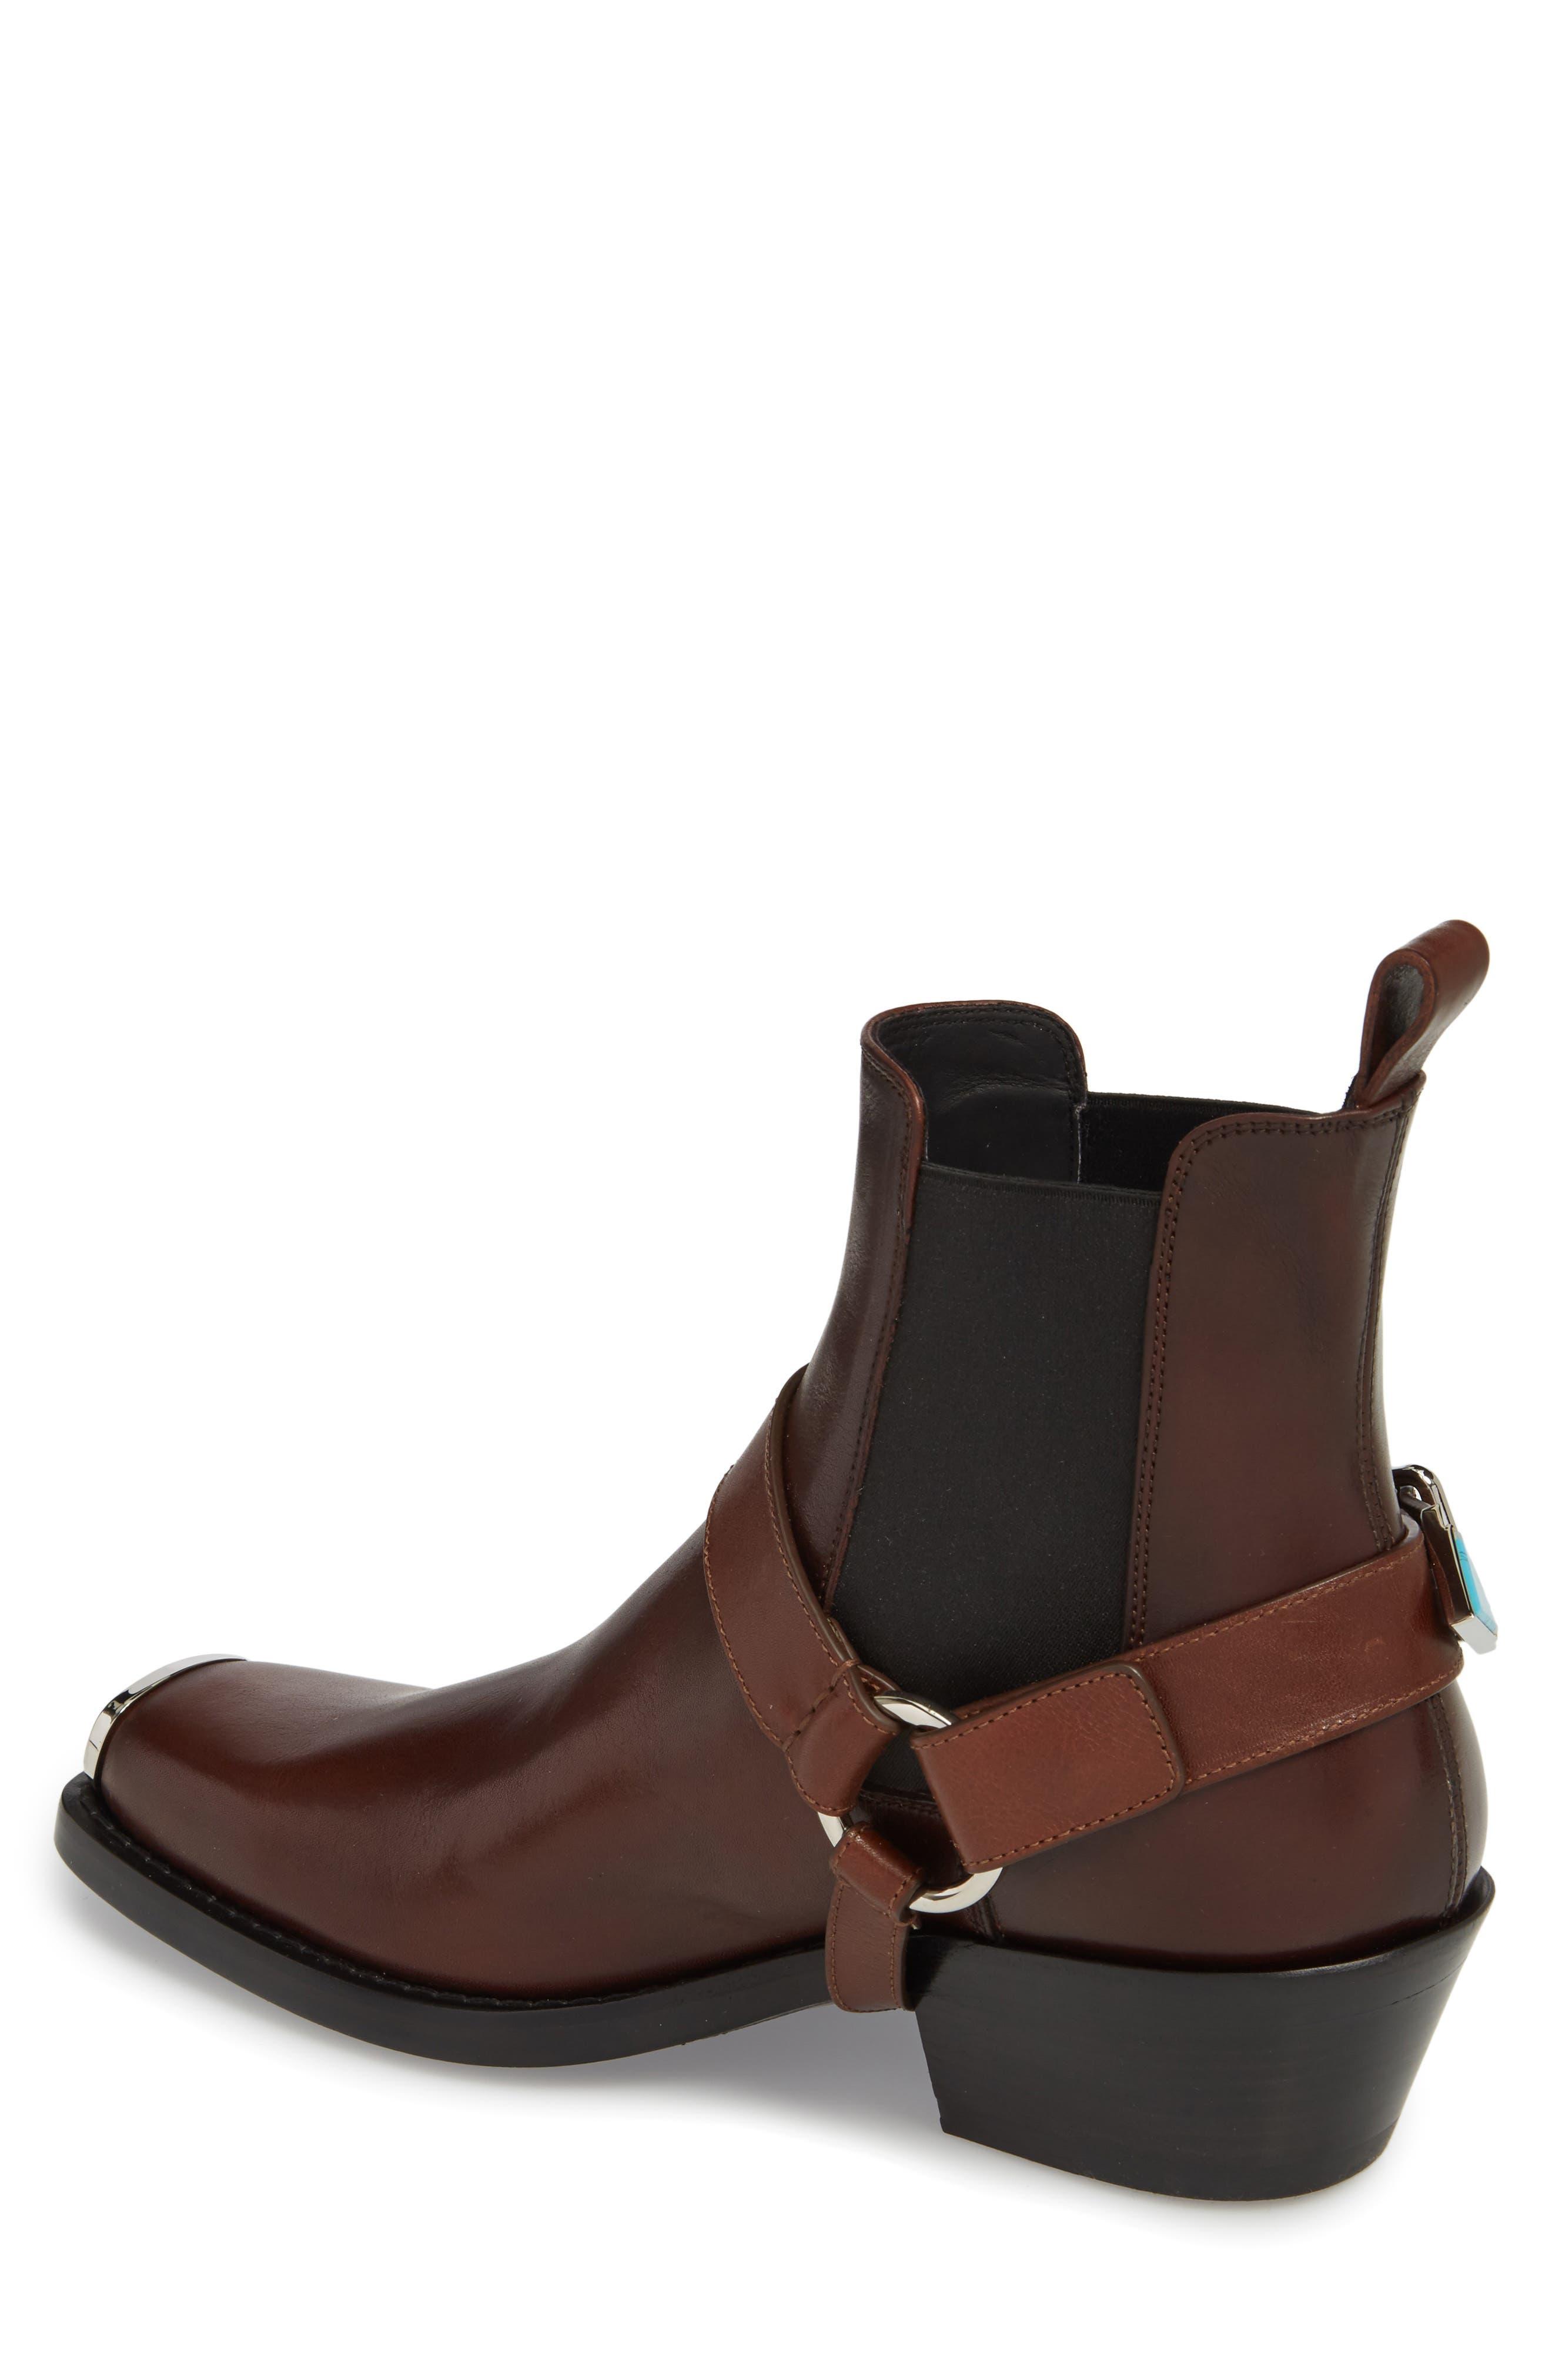 Alternate Image 2  - CALVIN KLEIN 205W39NYC Harness Chelsea Boot (Men)